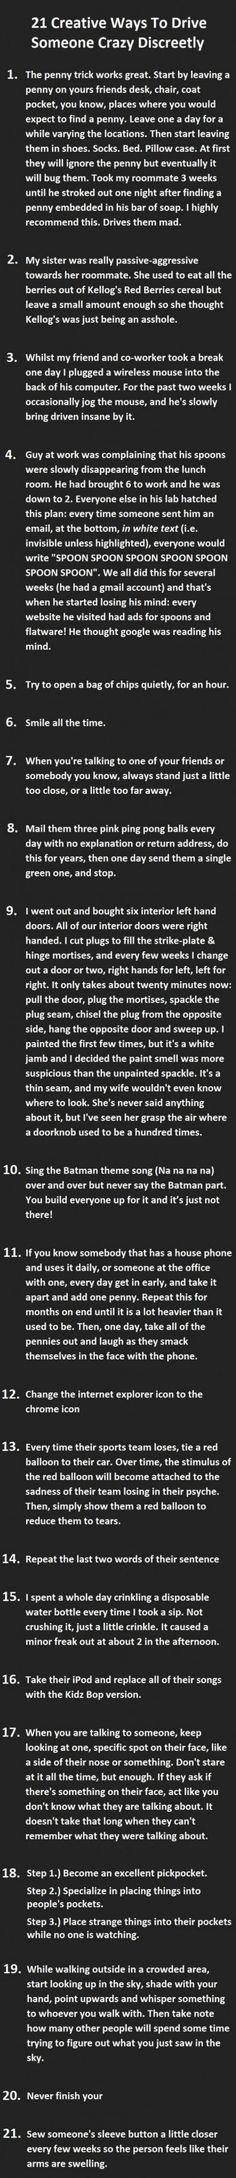 21 Ways to Drive Someone Crazy - 3, 4, 5, 10!